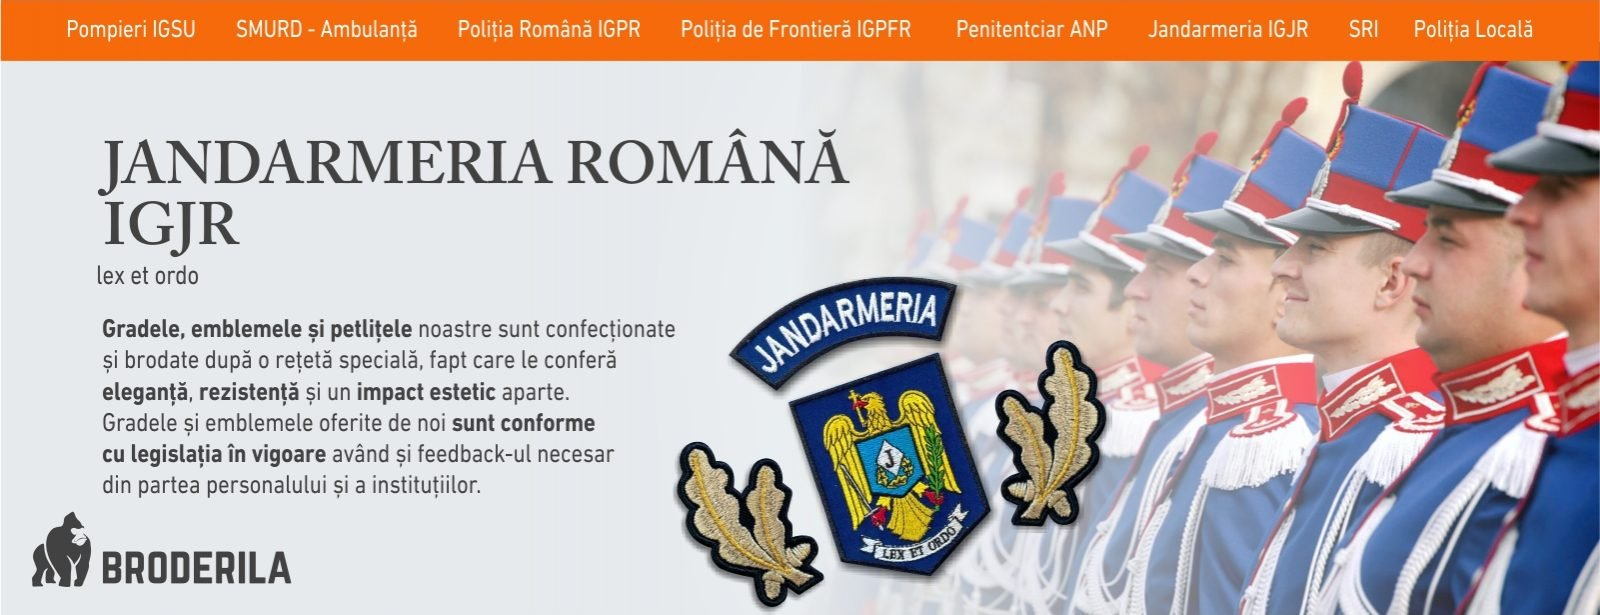 emblema jandarmeria romana igjr grade militare brodate jandarmeria igjr petlite jandarmerie emblema coifura jandarmeria romana igjr